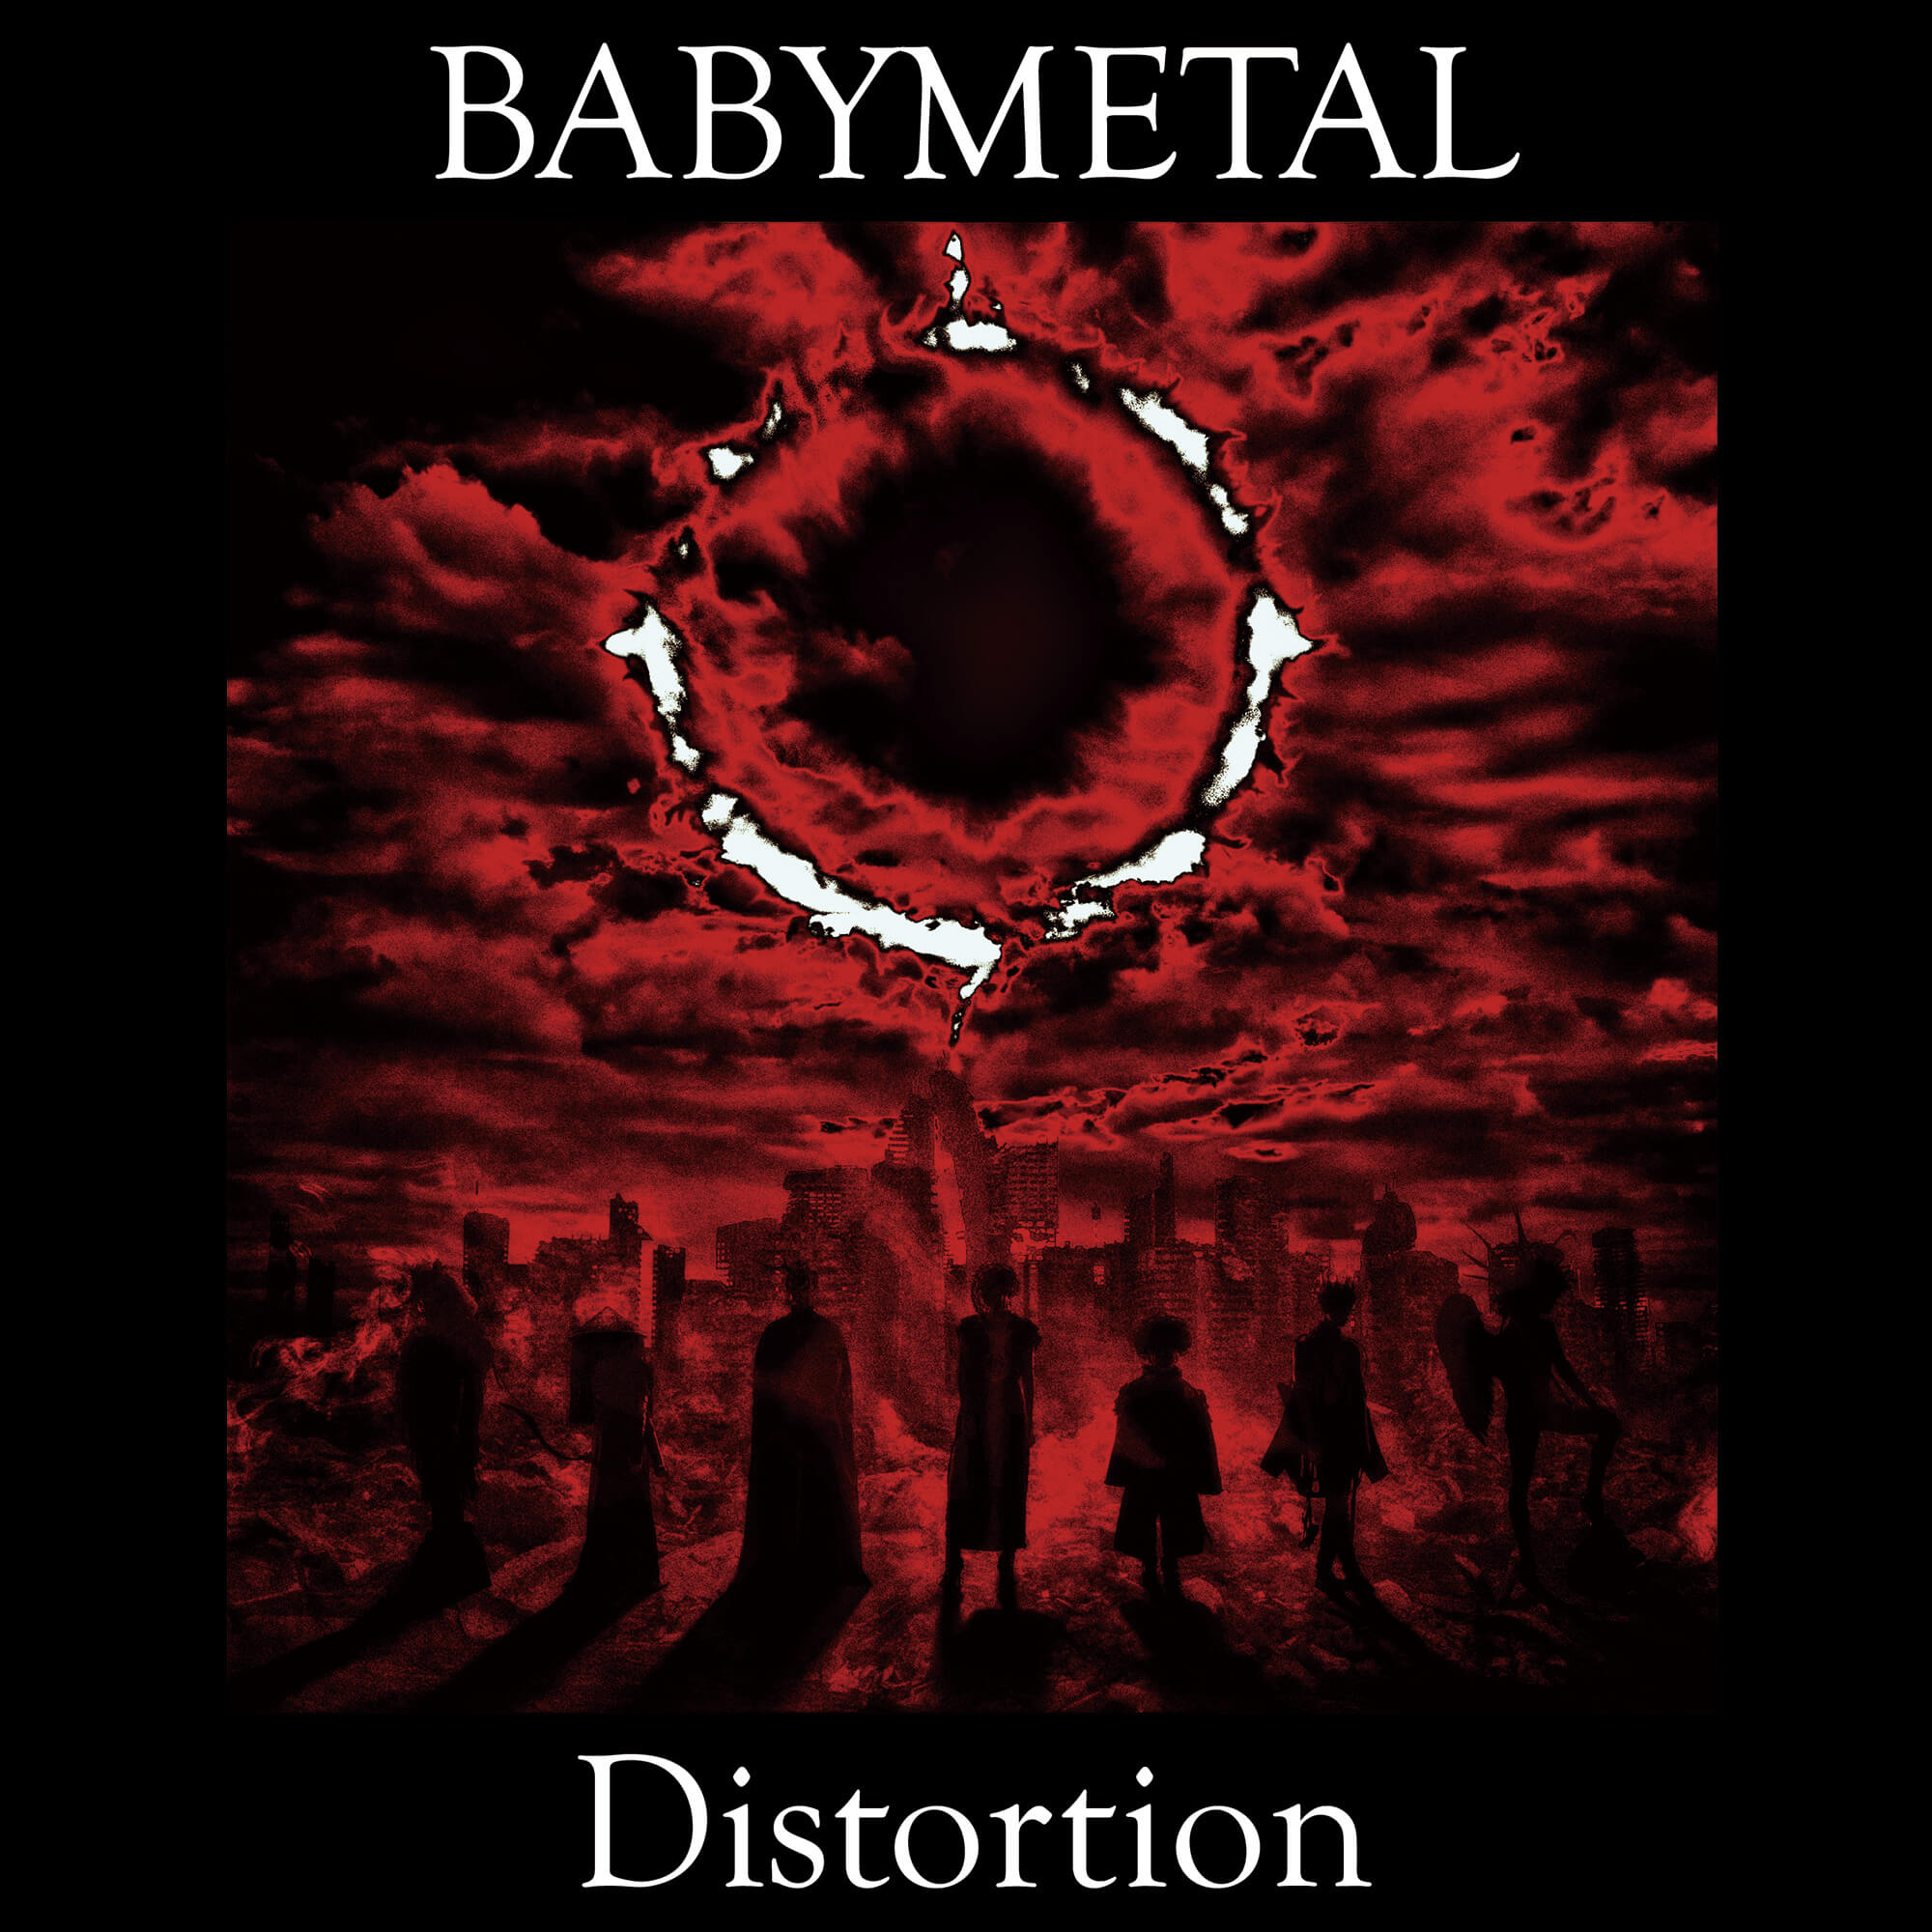 BABYMETAL_Distortion_JP_TFJC38033kari